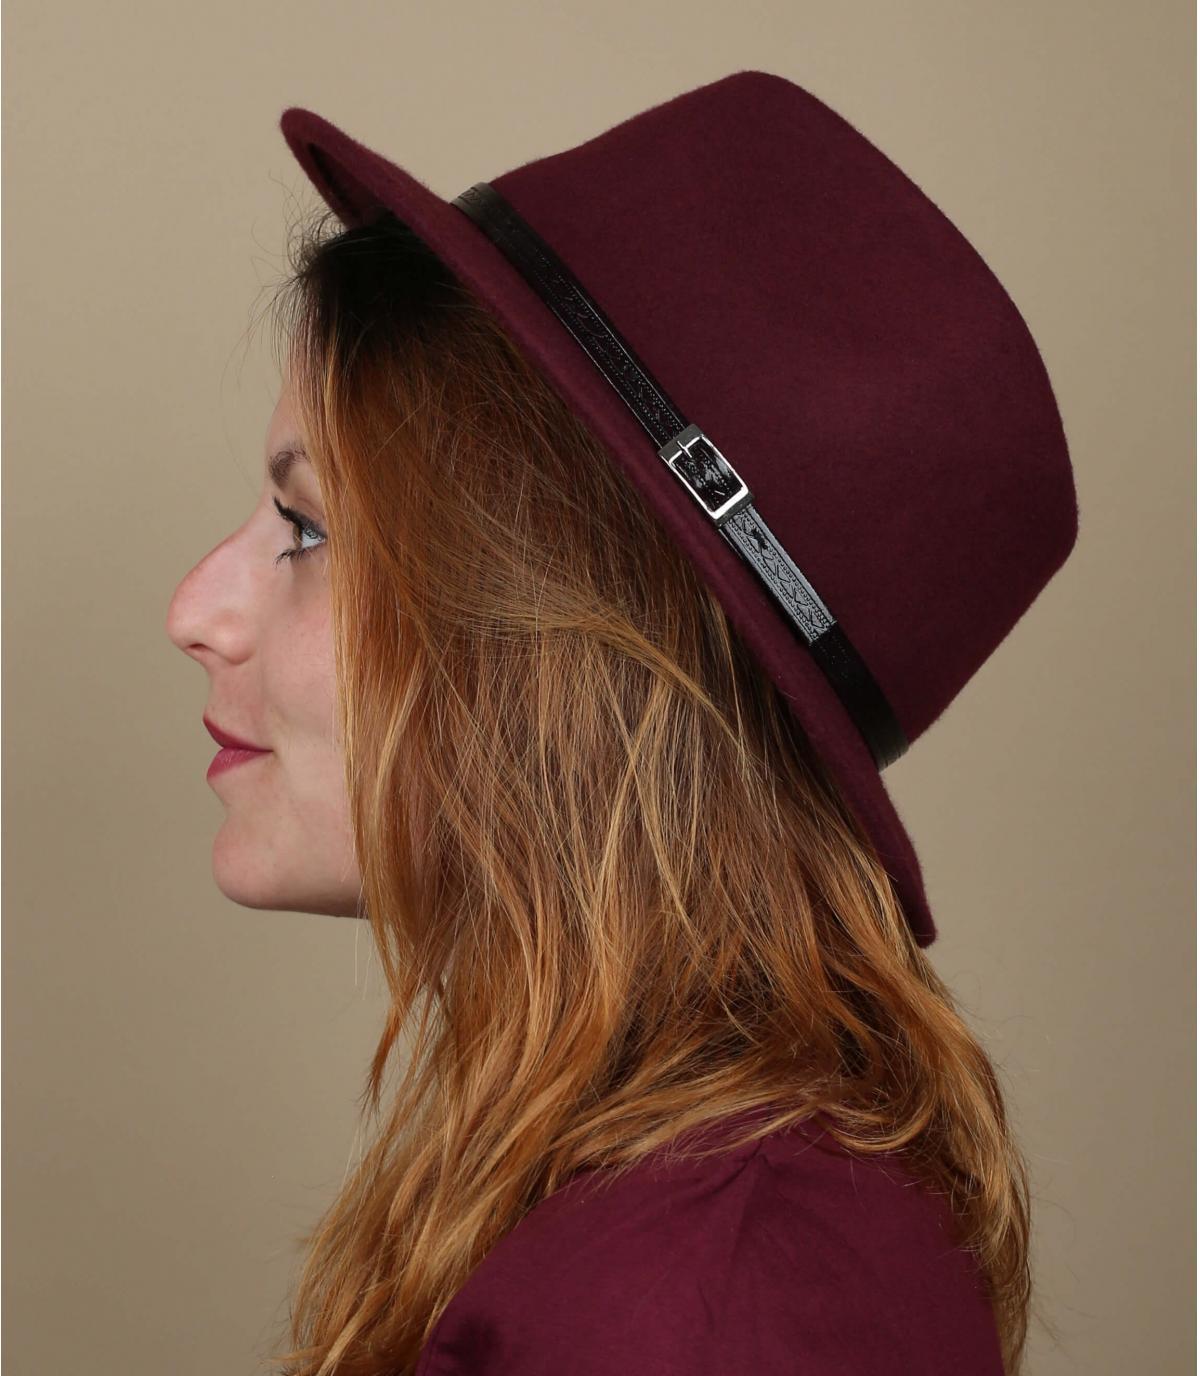 cappello bordeaux in feltro